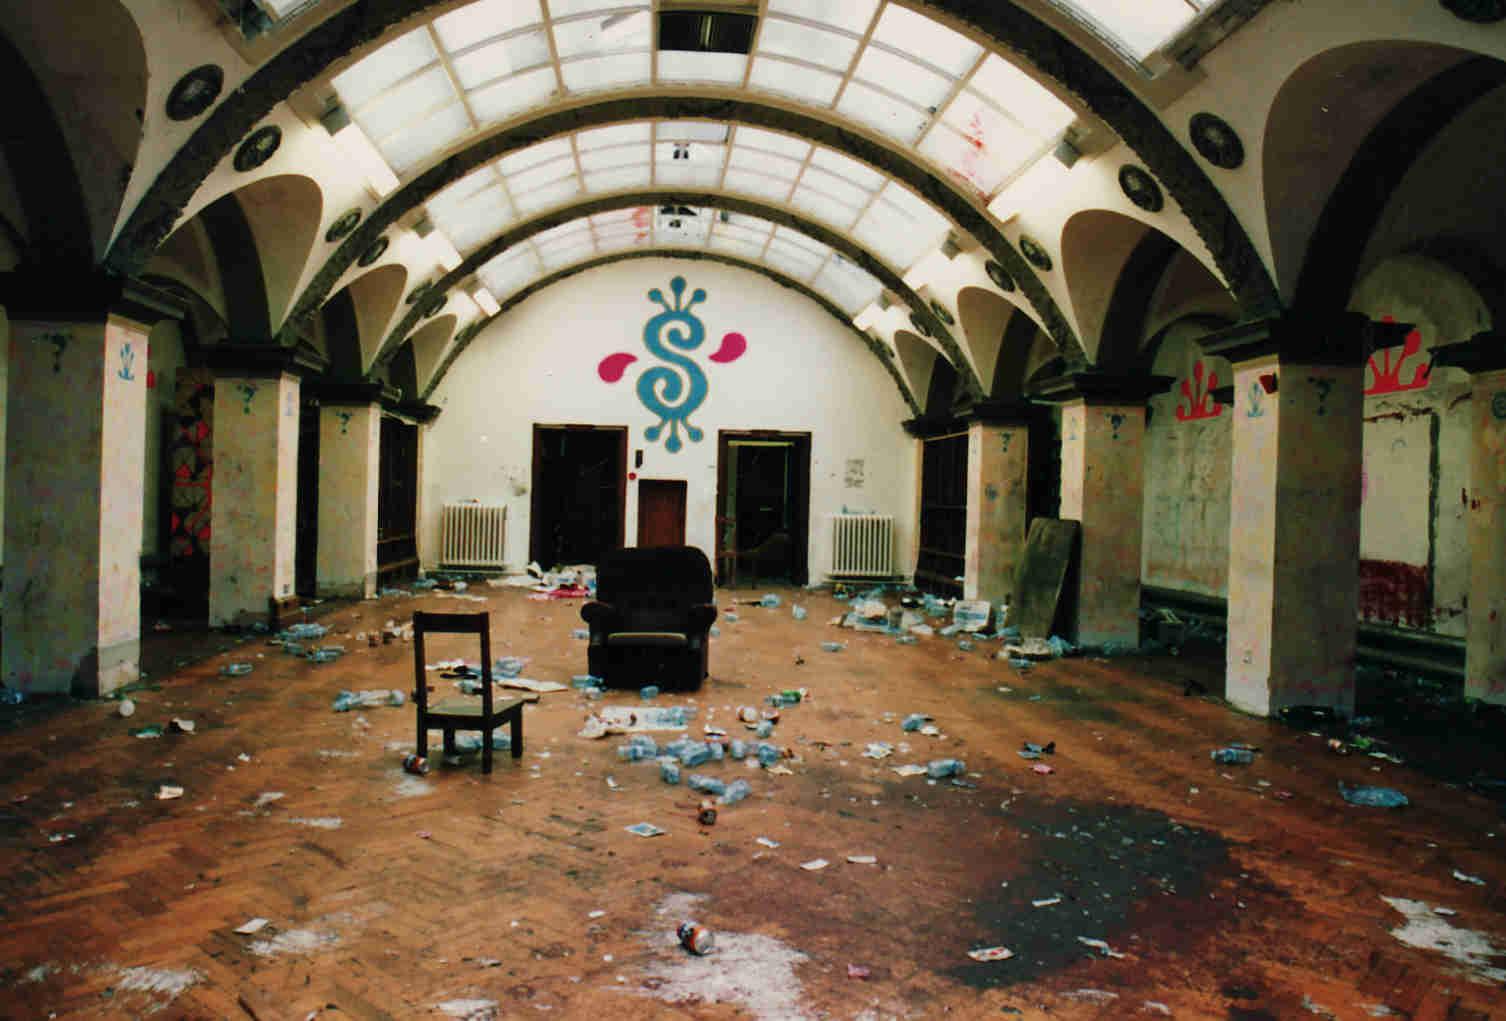 Indoor Rave aftermath